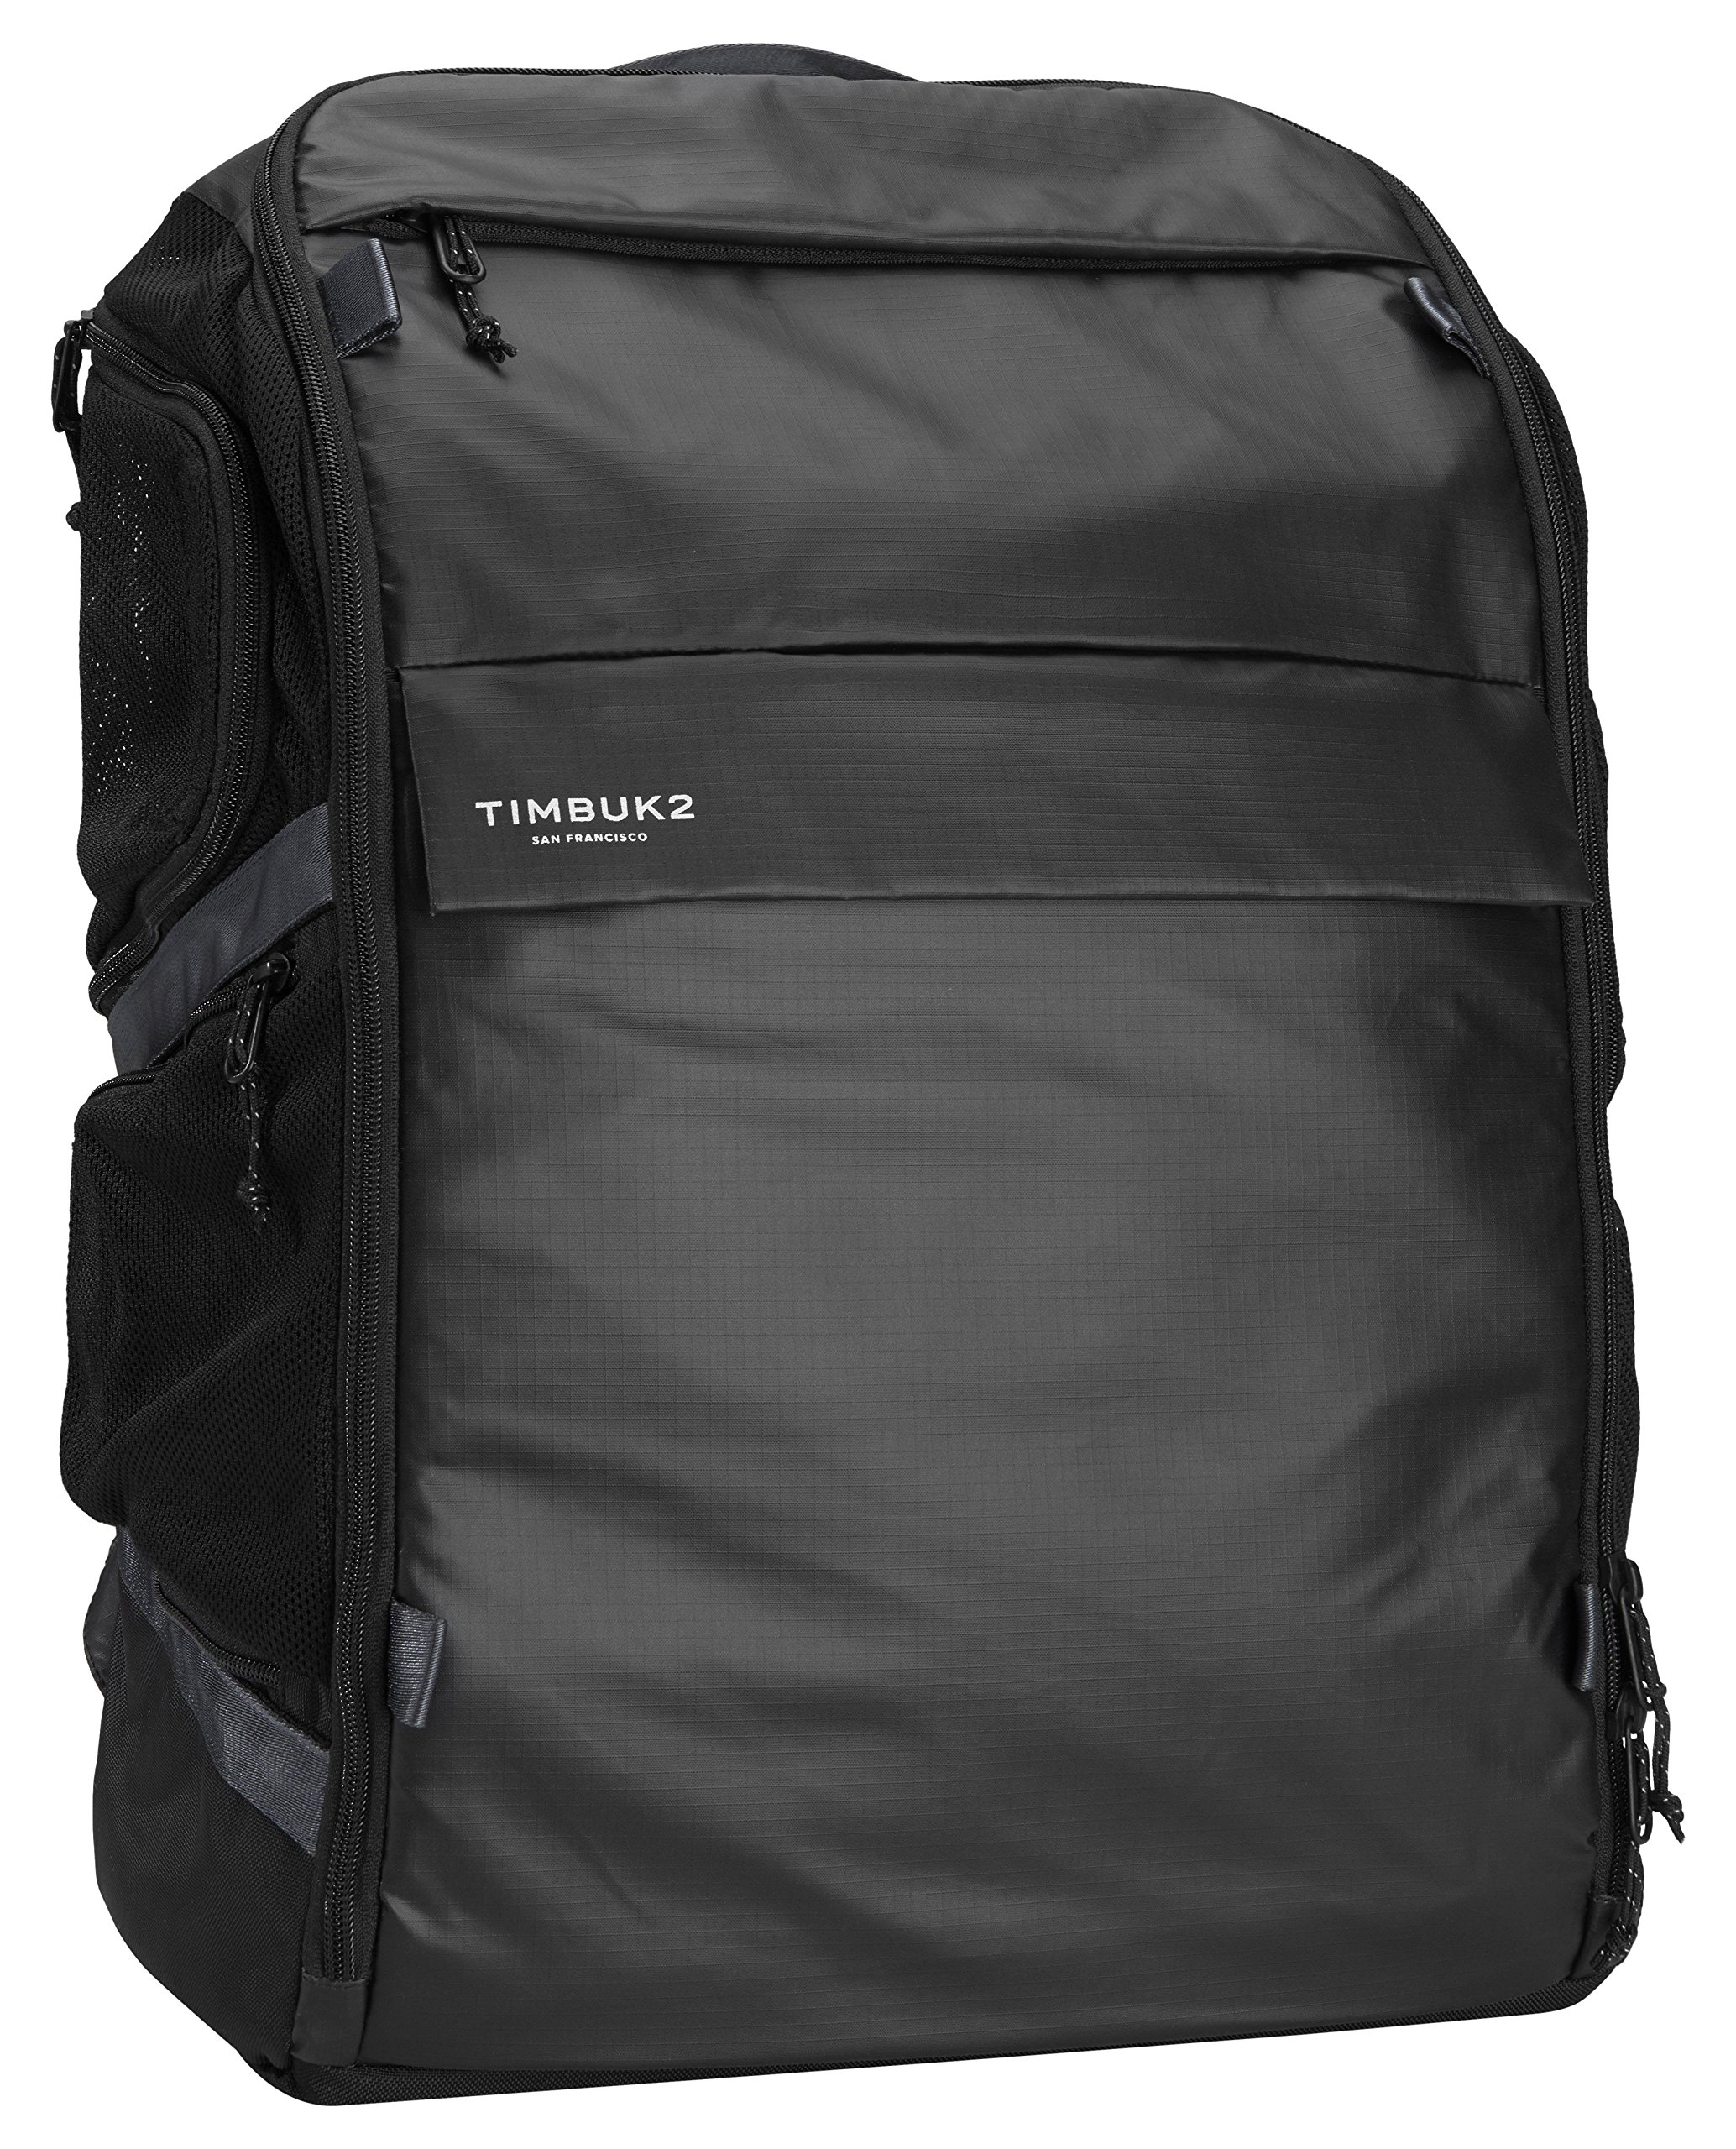 Timbuk2 Muttmover Light Daypack, Jet Black Light Rip, Medium